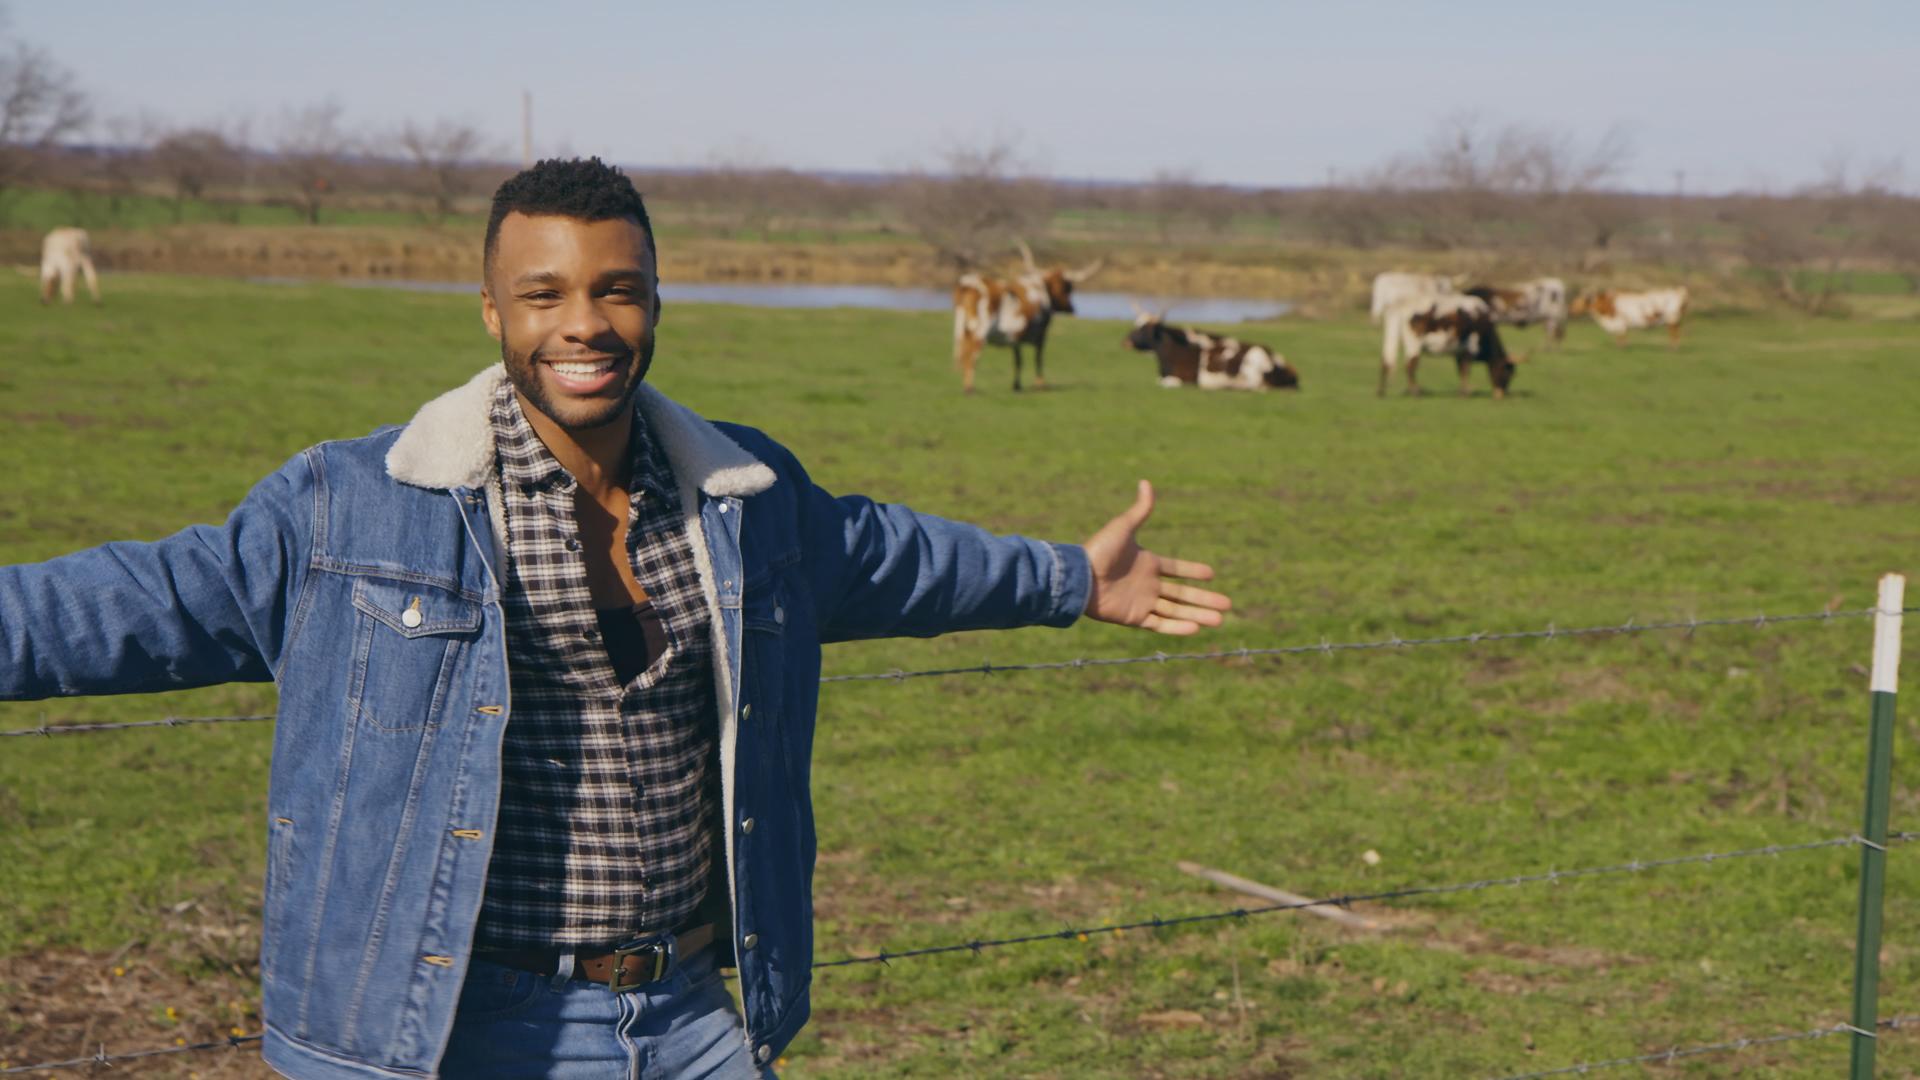 Best-bets for June 12: Time-trek views of gays in America